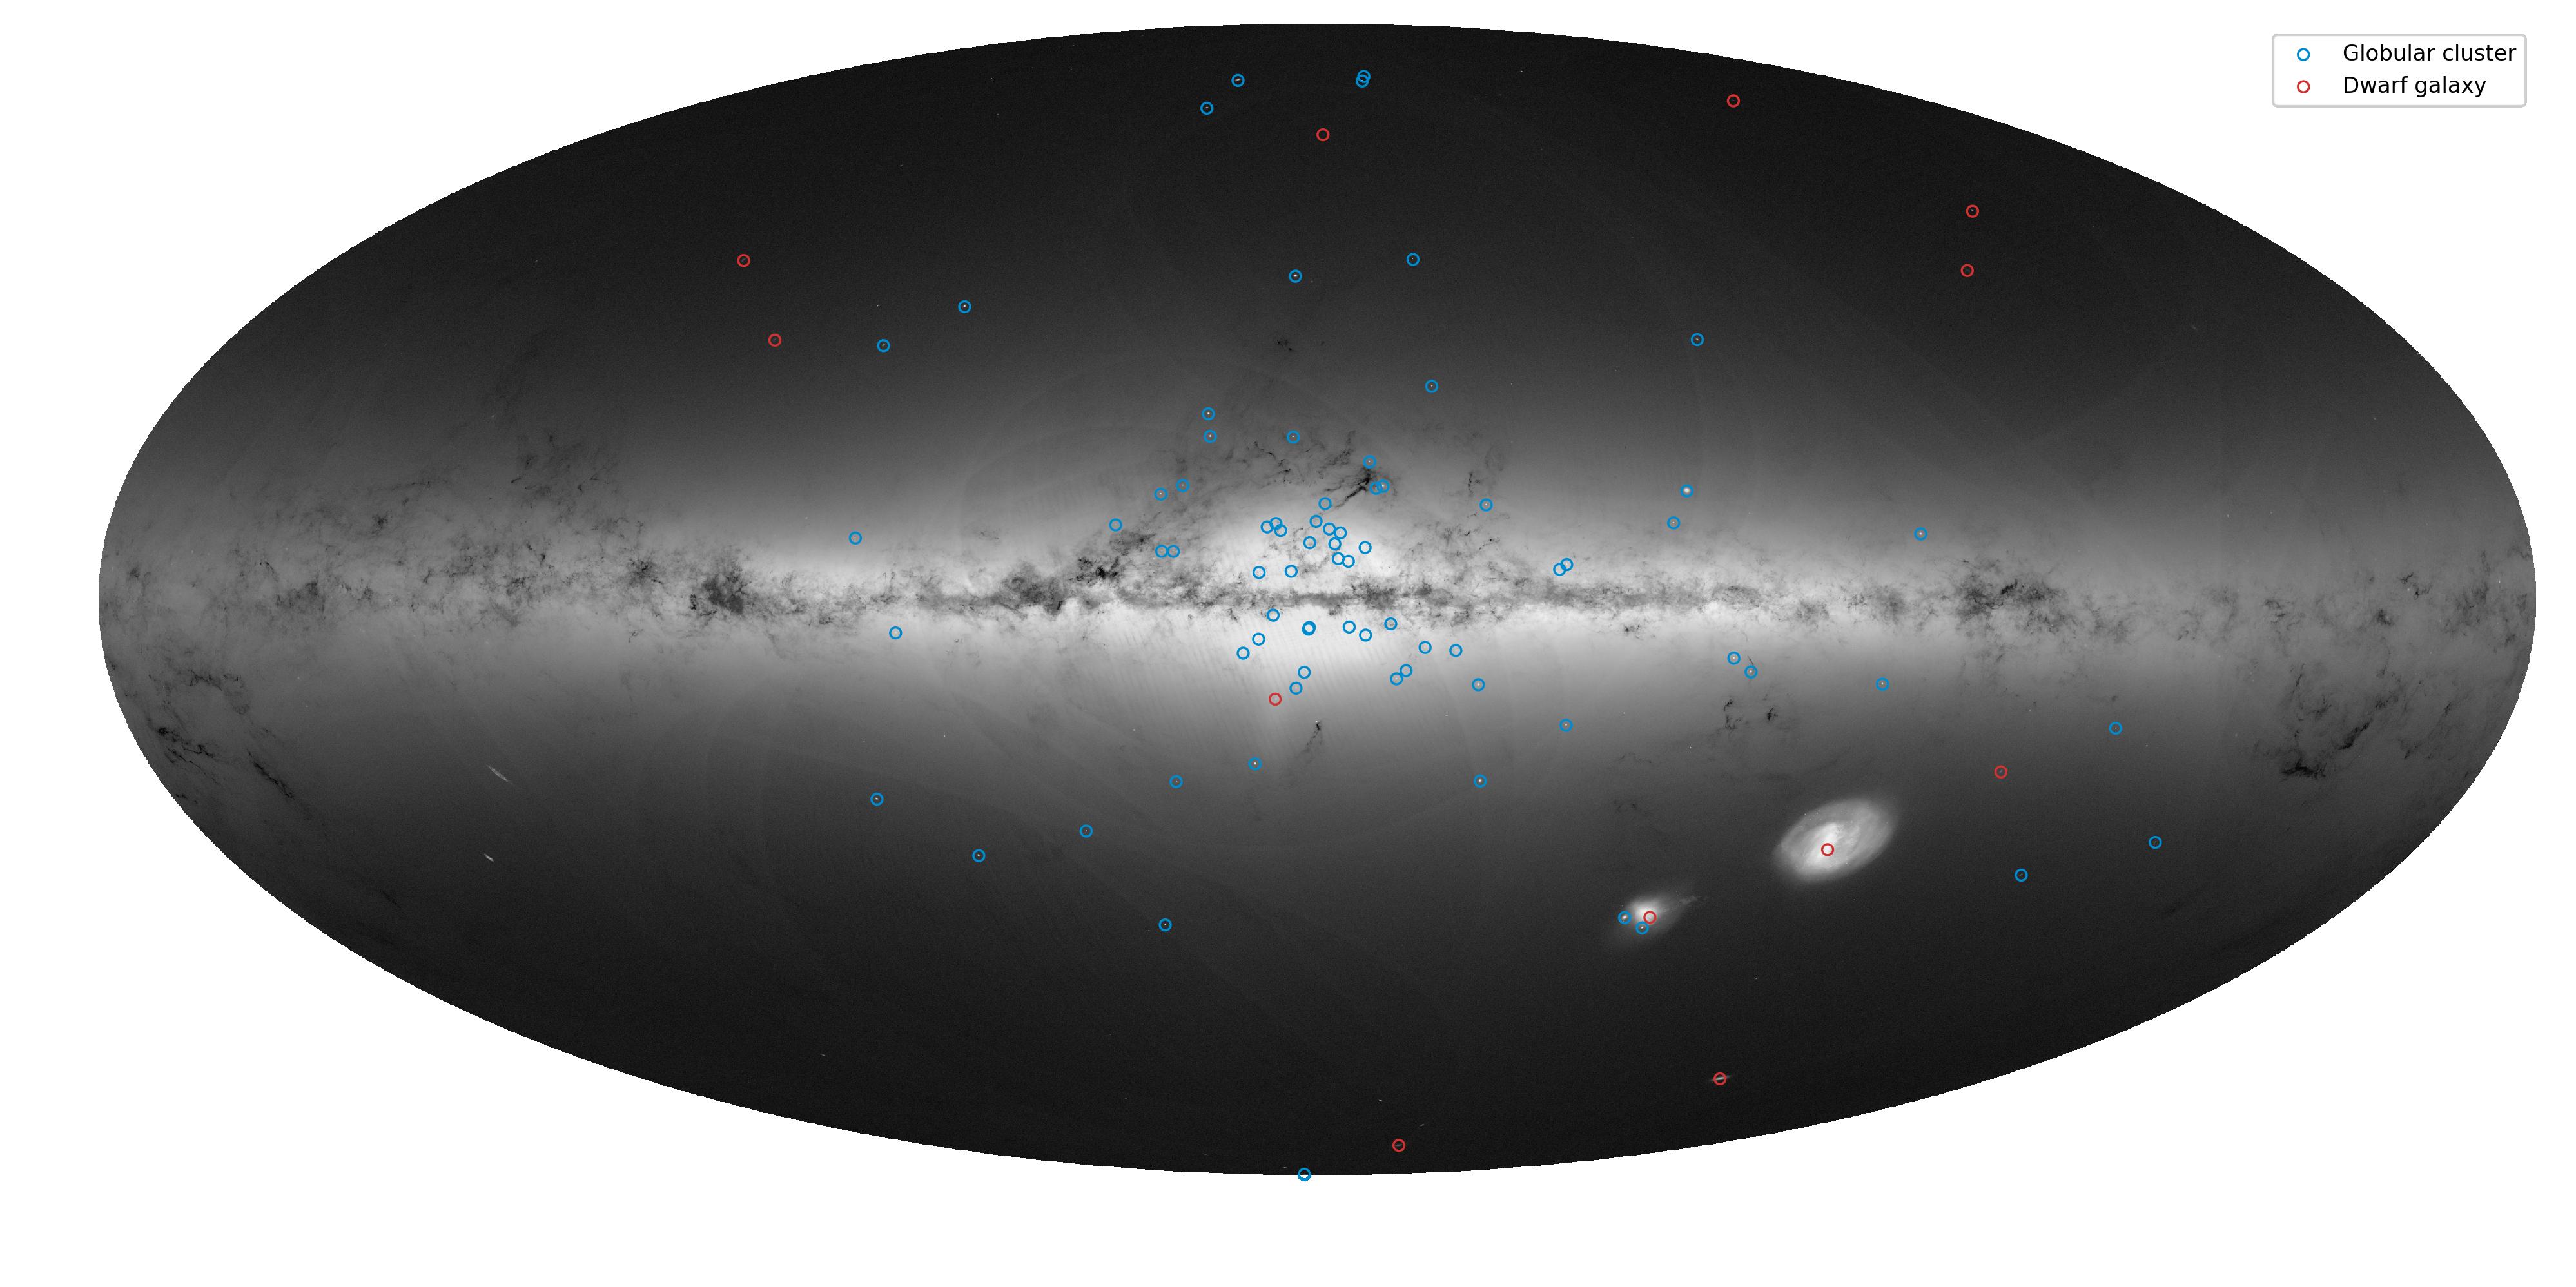 Universe clipart milky way galaxy. Gaia dr the kinematics